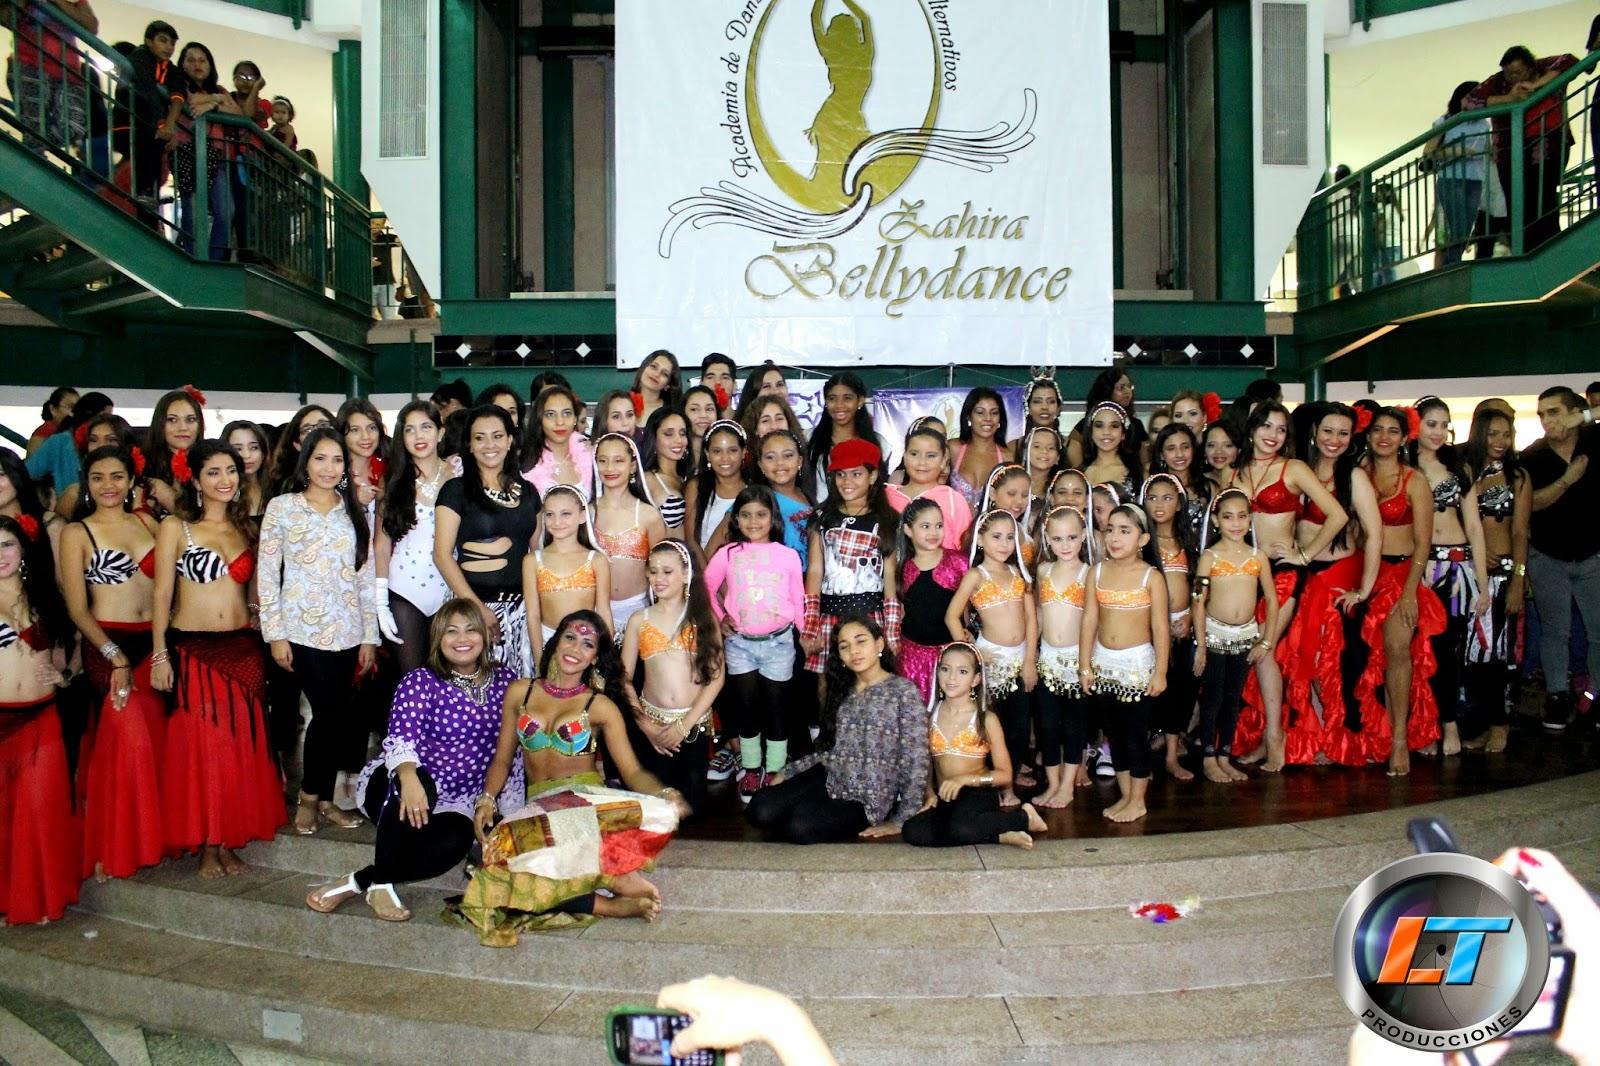 Zahira Bellydance celebró su 5to Aniversario en Barcelona  1486a6bf50b